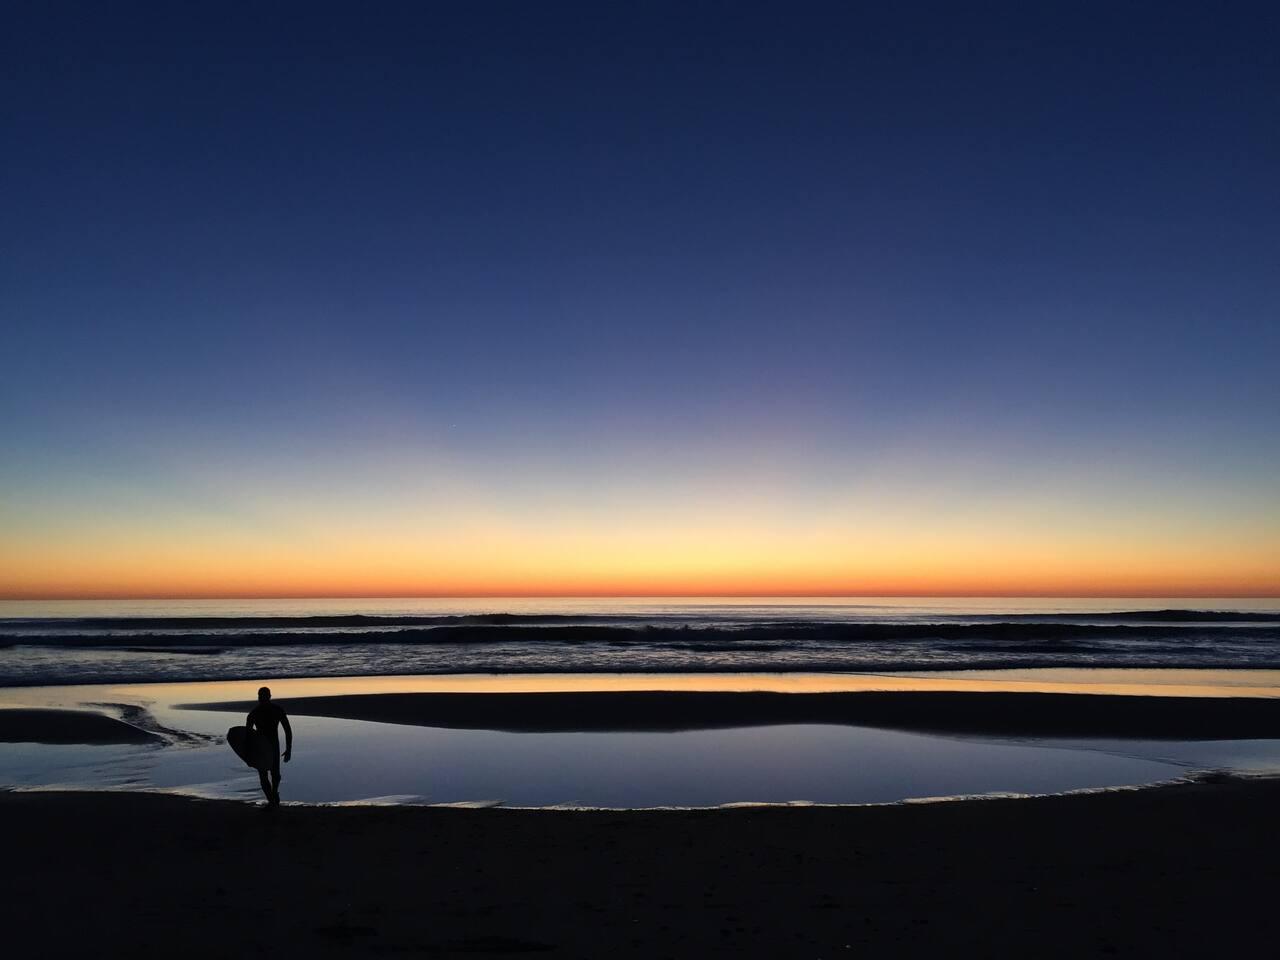 La Selva Beach surfing into the evening